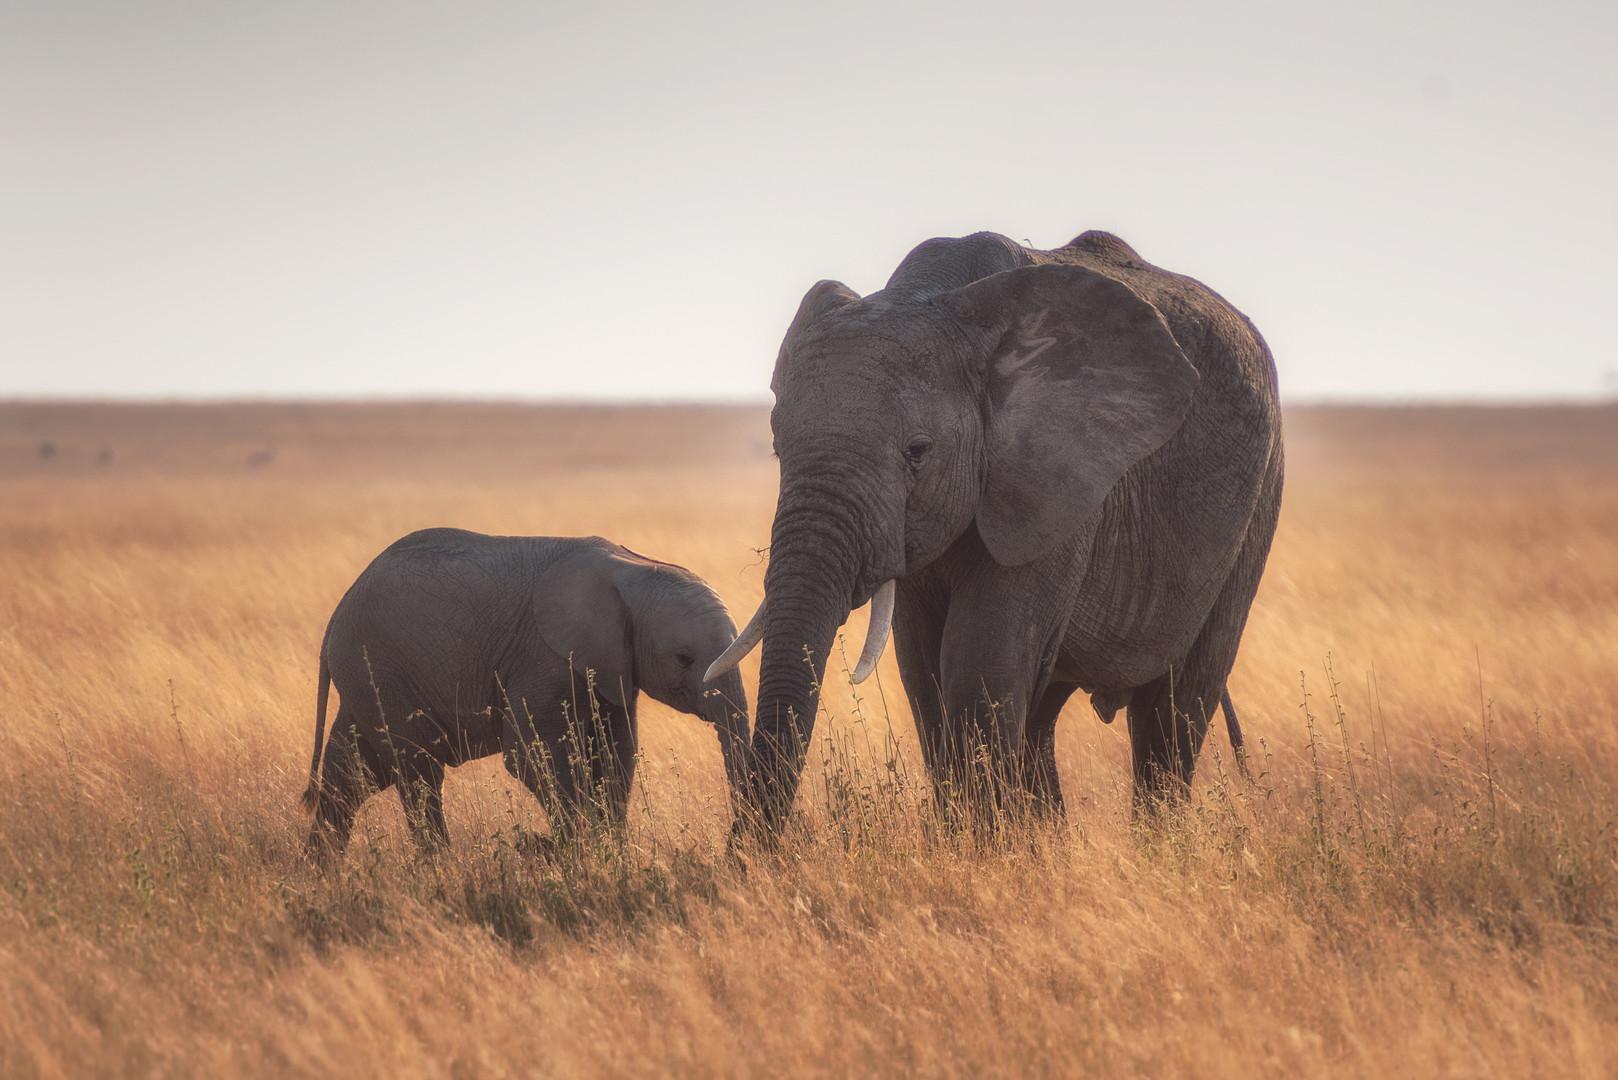 elephants Tanzanie safari.jpg